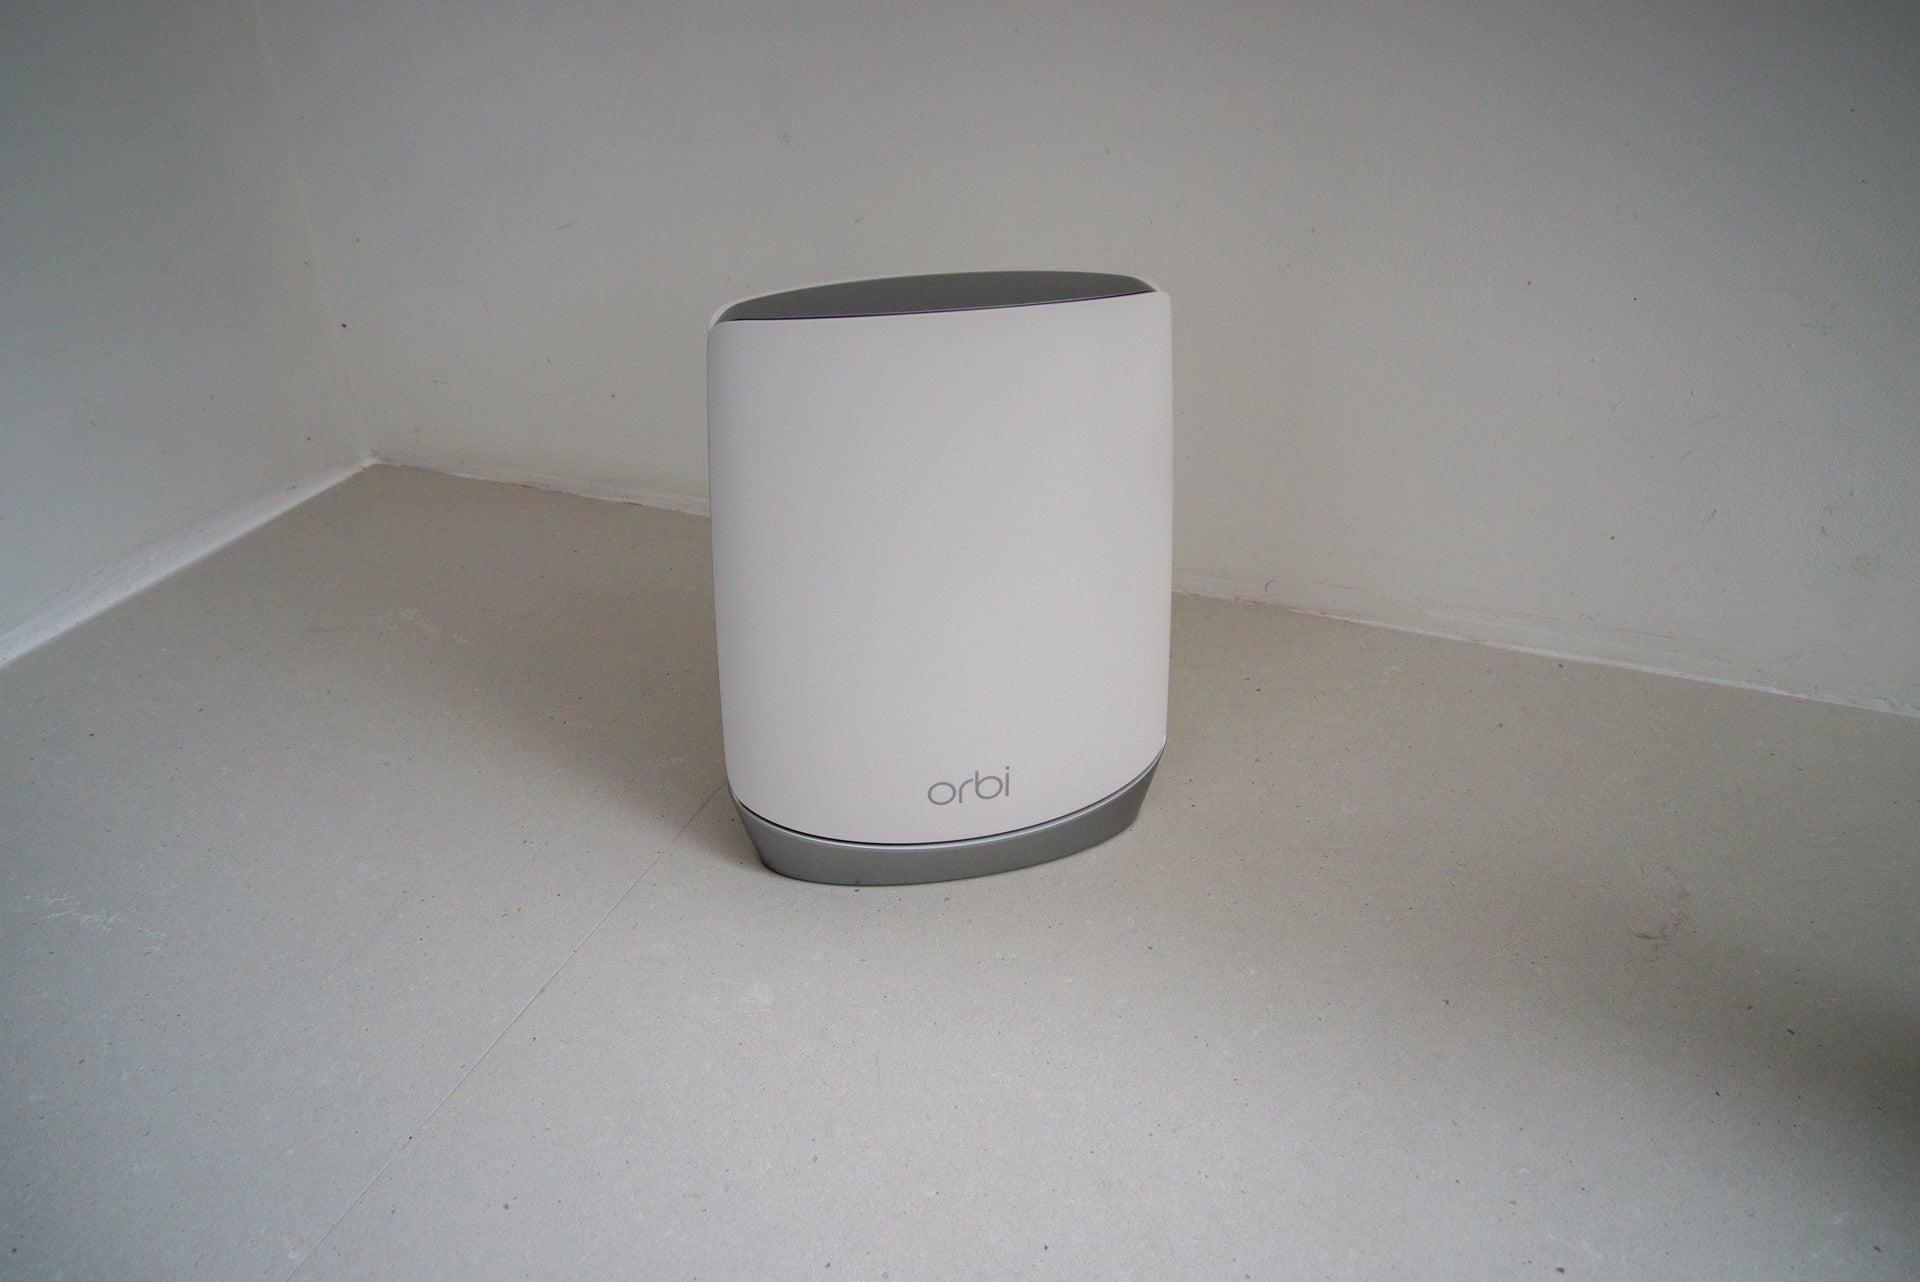 Netgear Orbi Wifi 6 System (RBK752) router